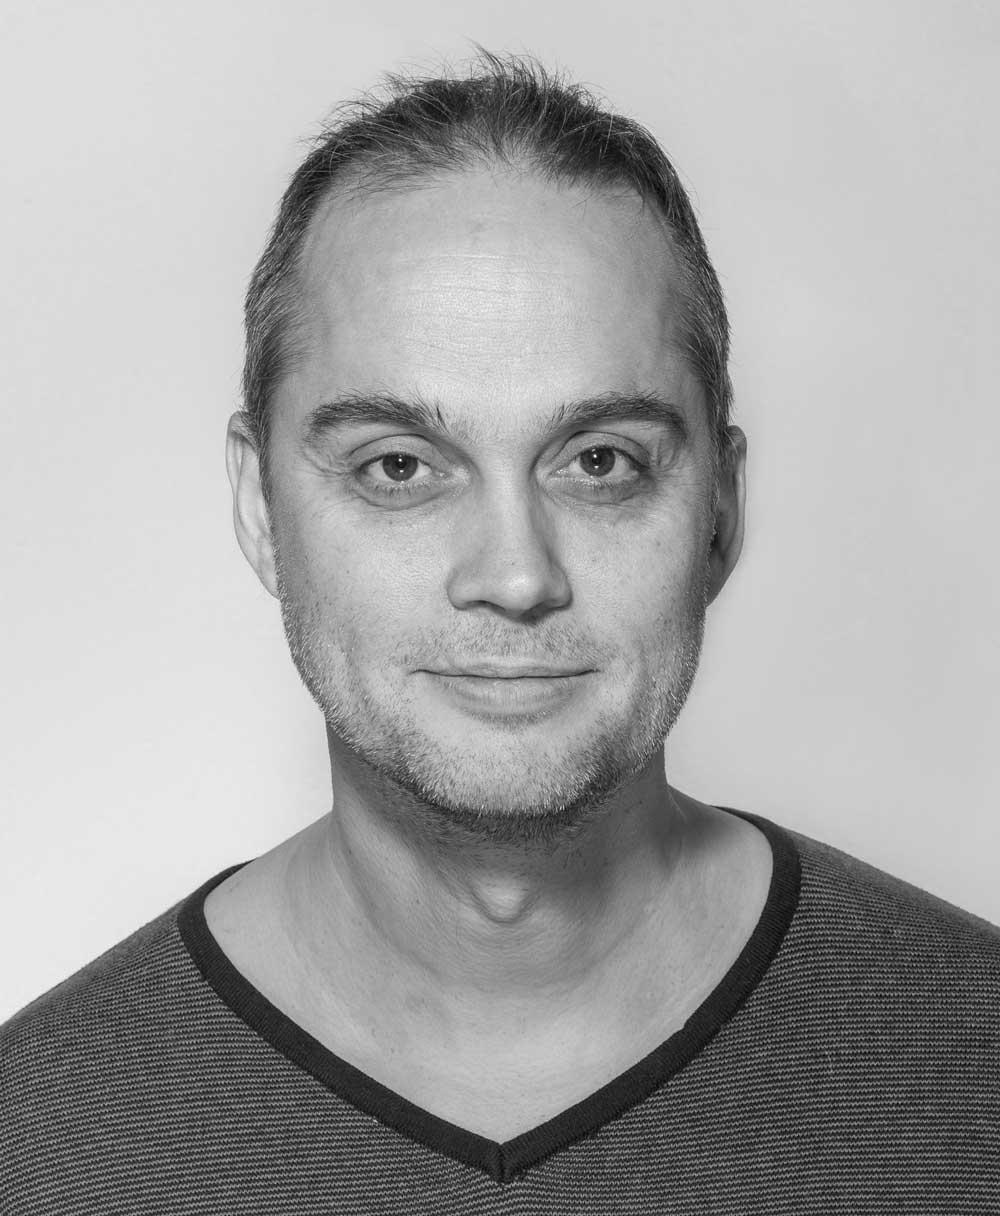 Klaus Løkholm Bergli, sykehusklovn